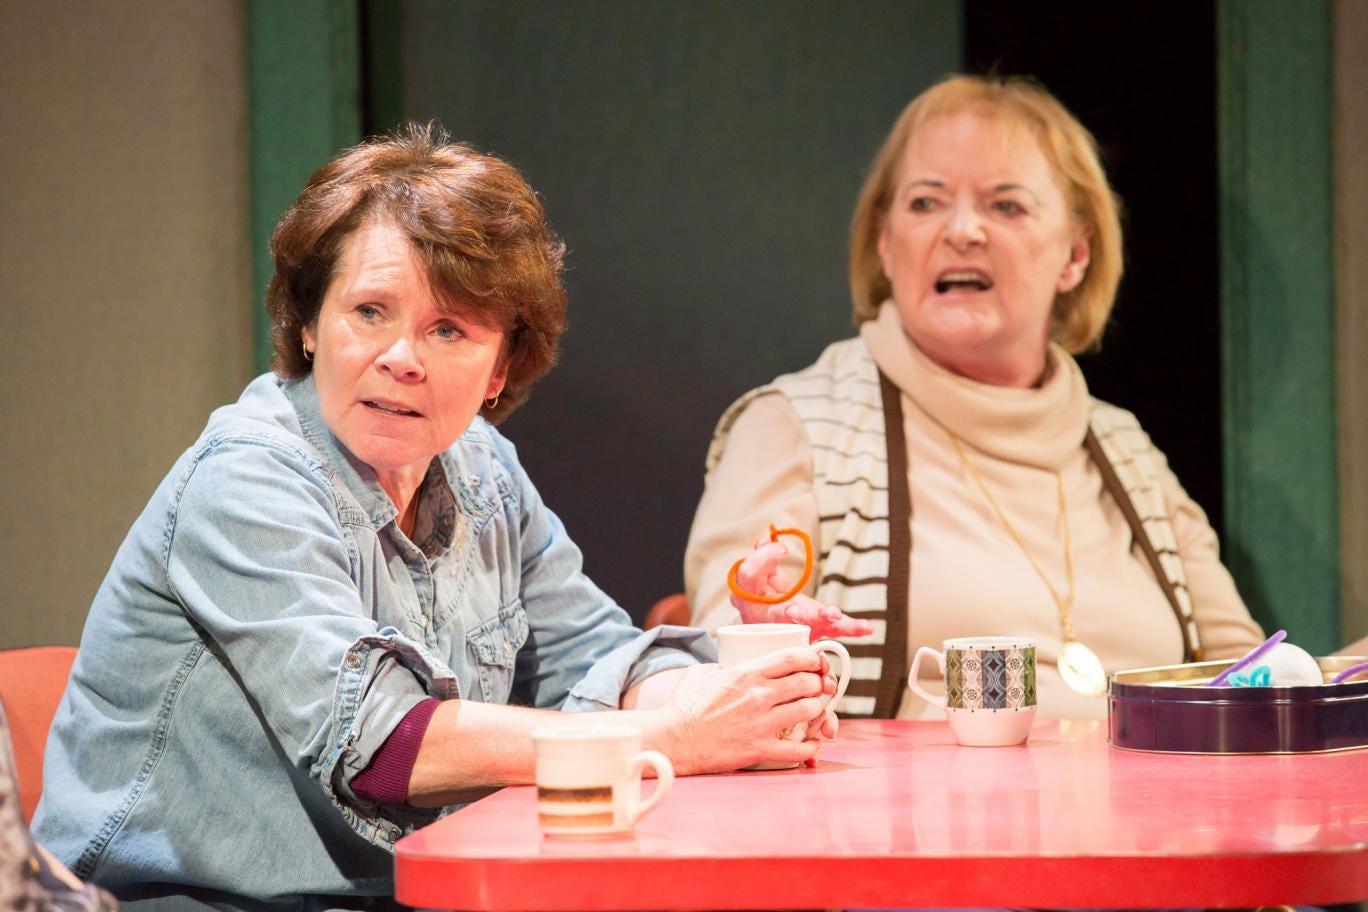 Imelda Staunton and June Watson in 'Good People'